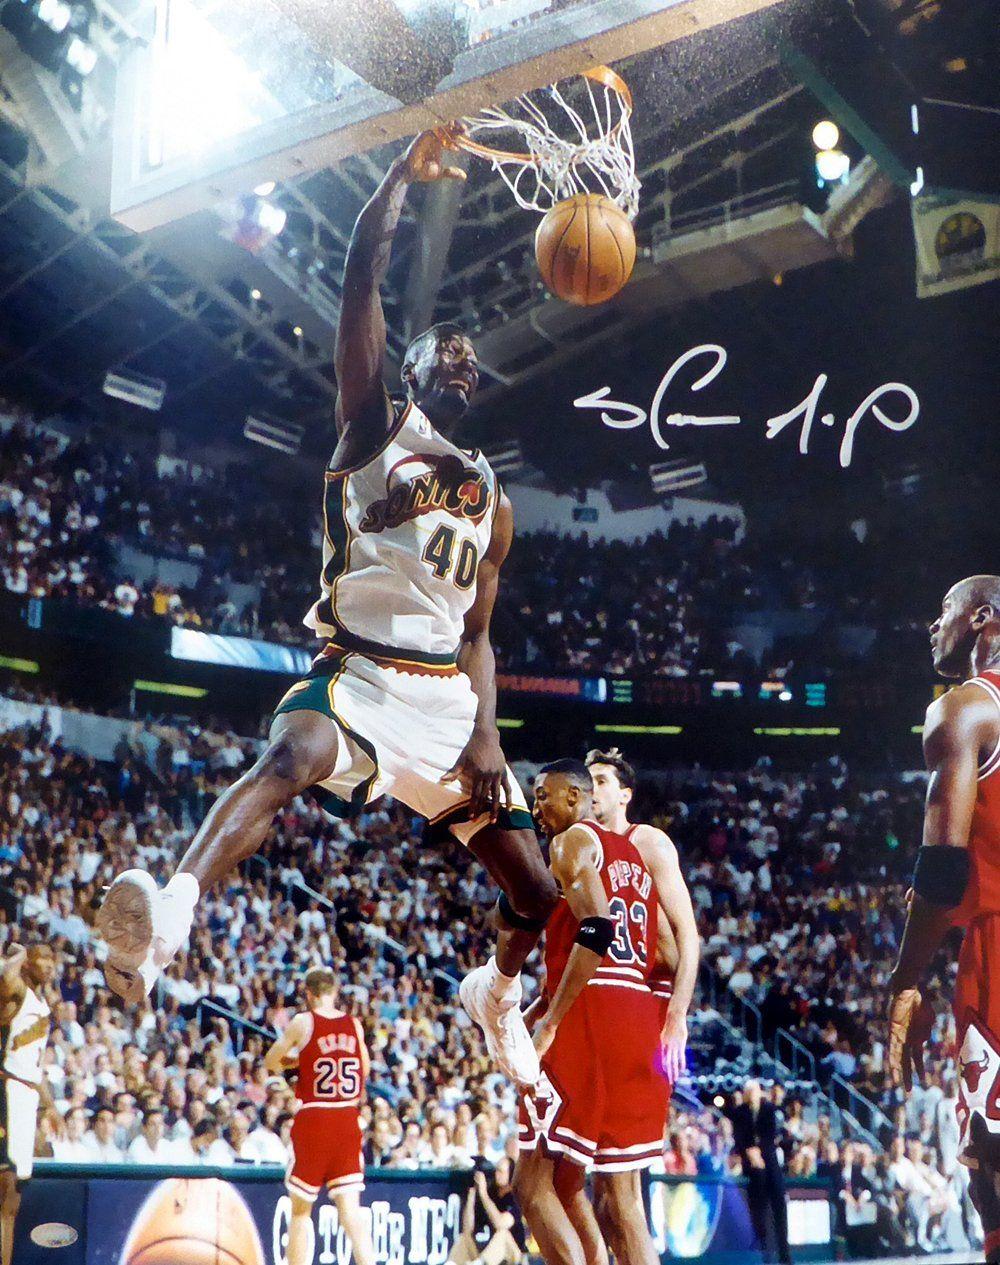 9b501016ac9db Shawn Kemp Autographed 16x20 Photo Seattle Sonics | Basketball ...